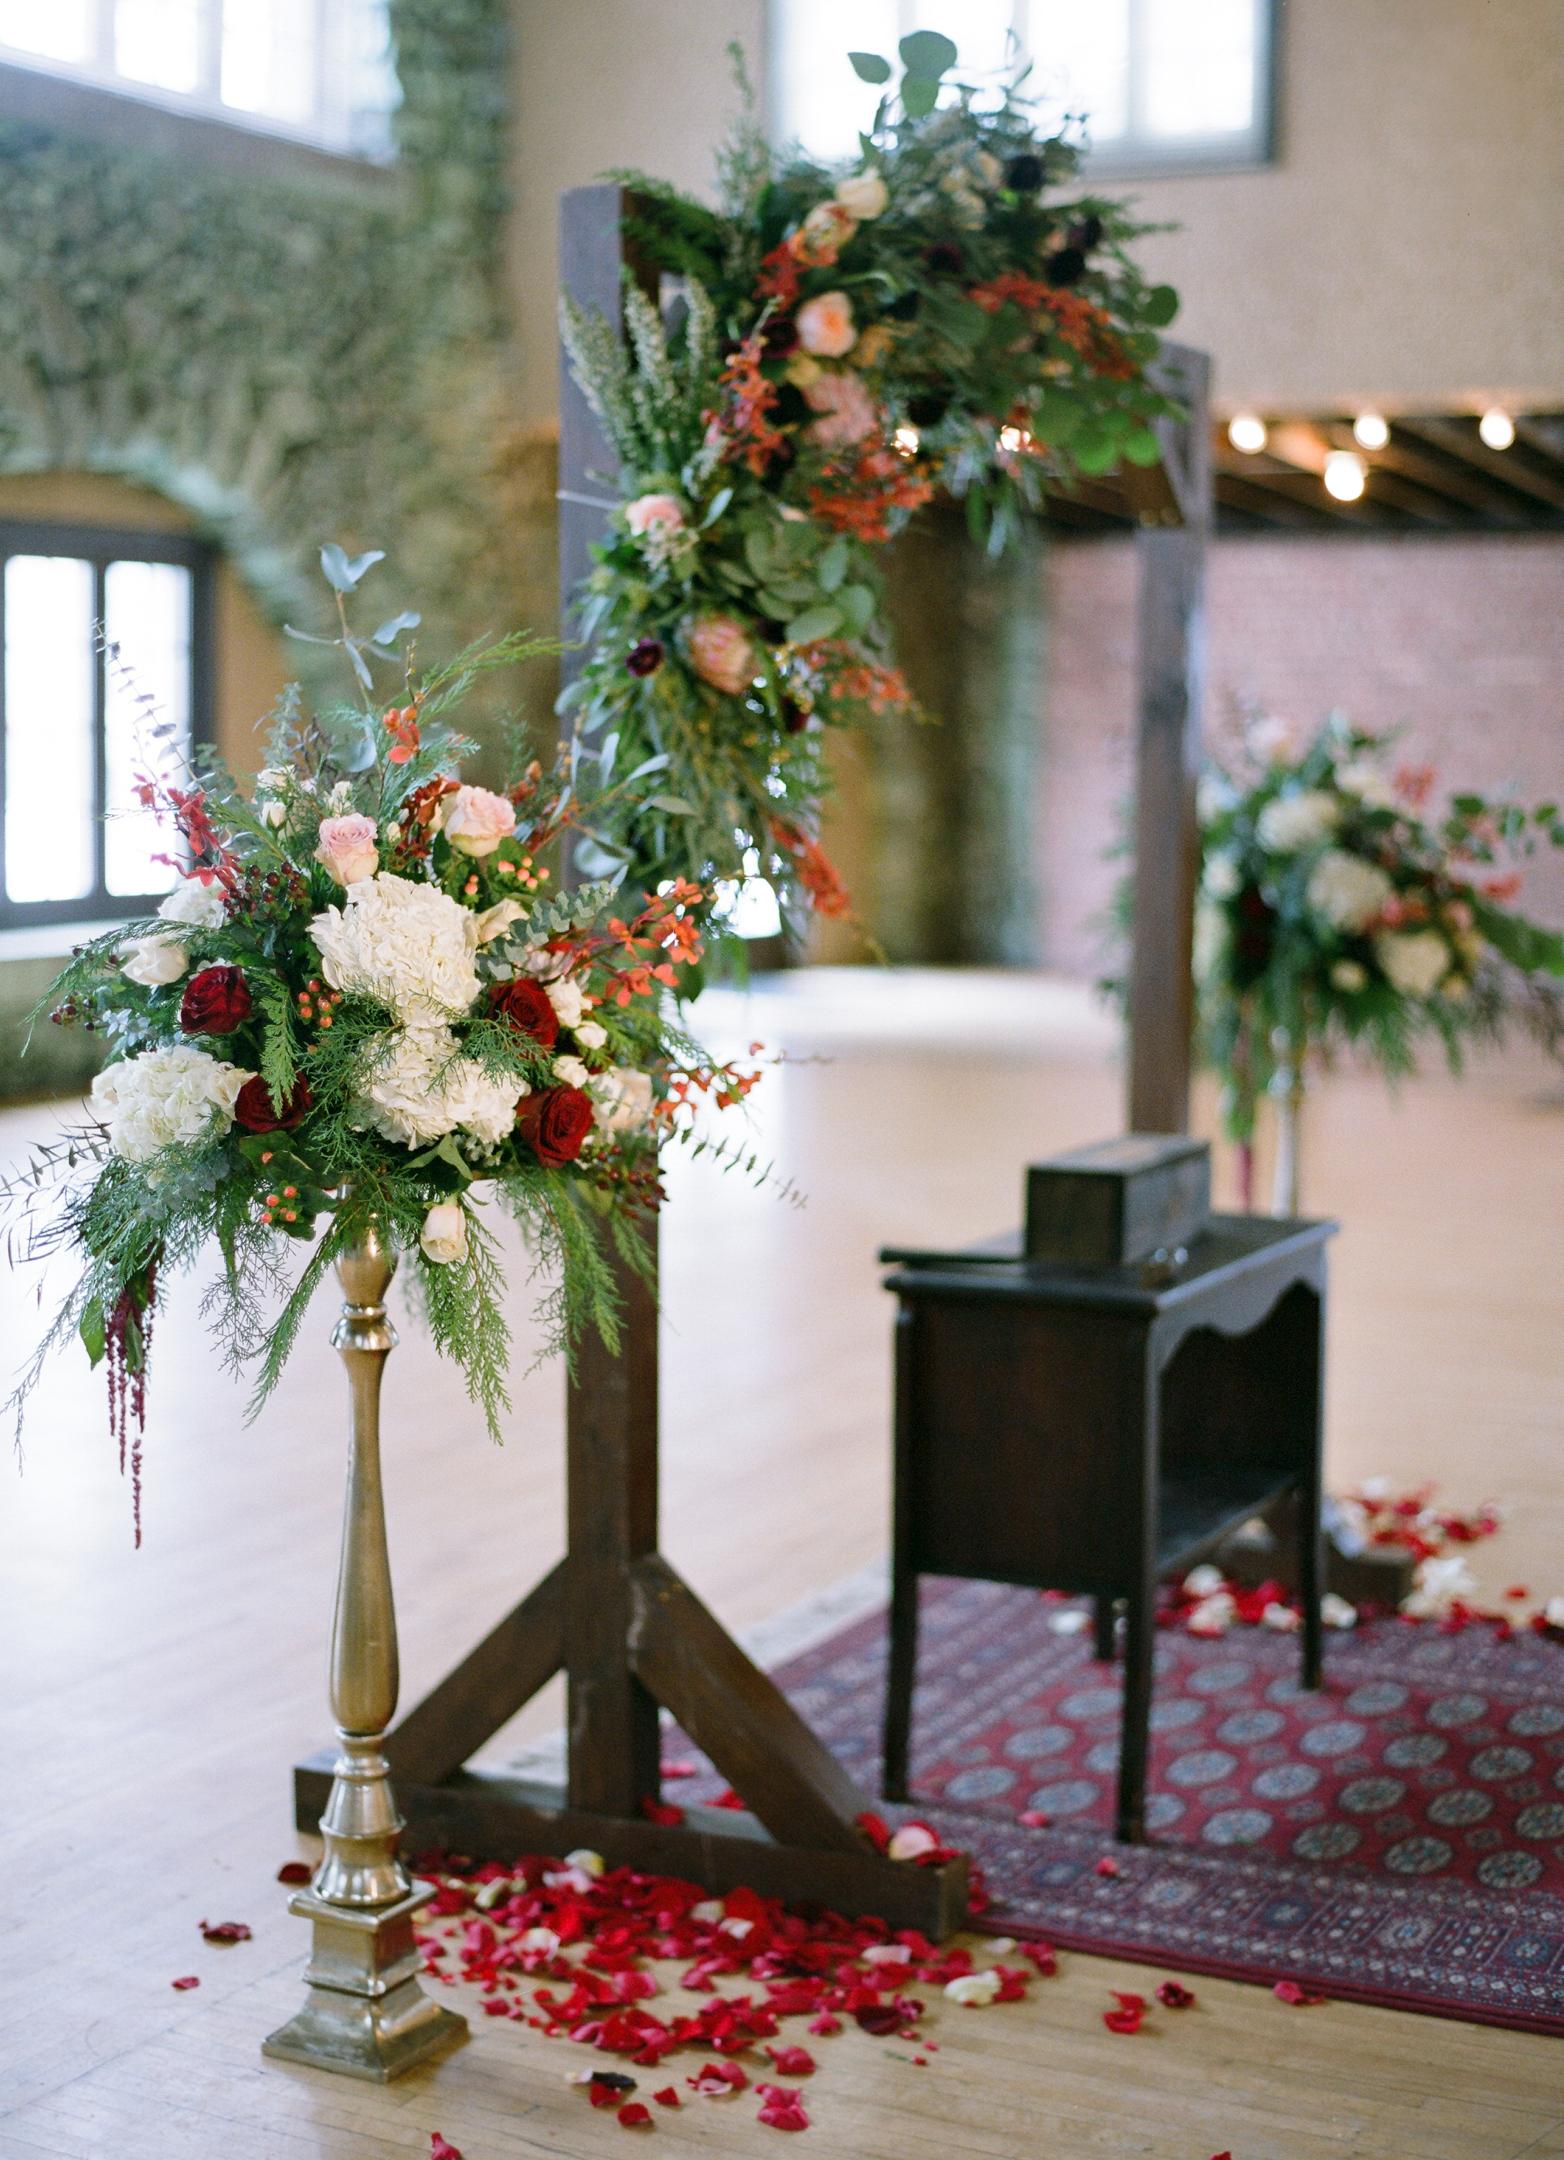 Rothschild Pavilion wedding ceremony decor